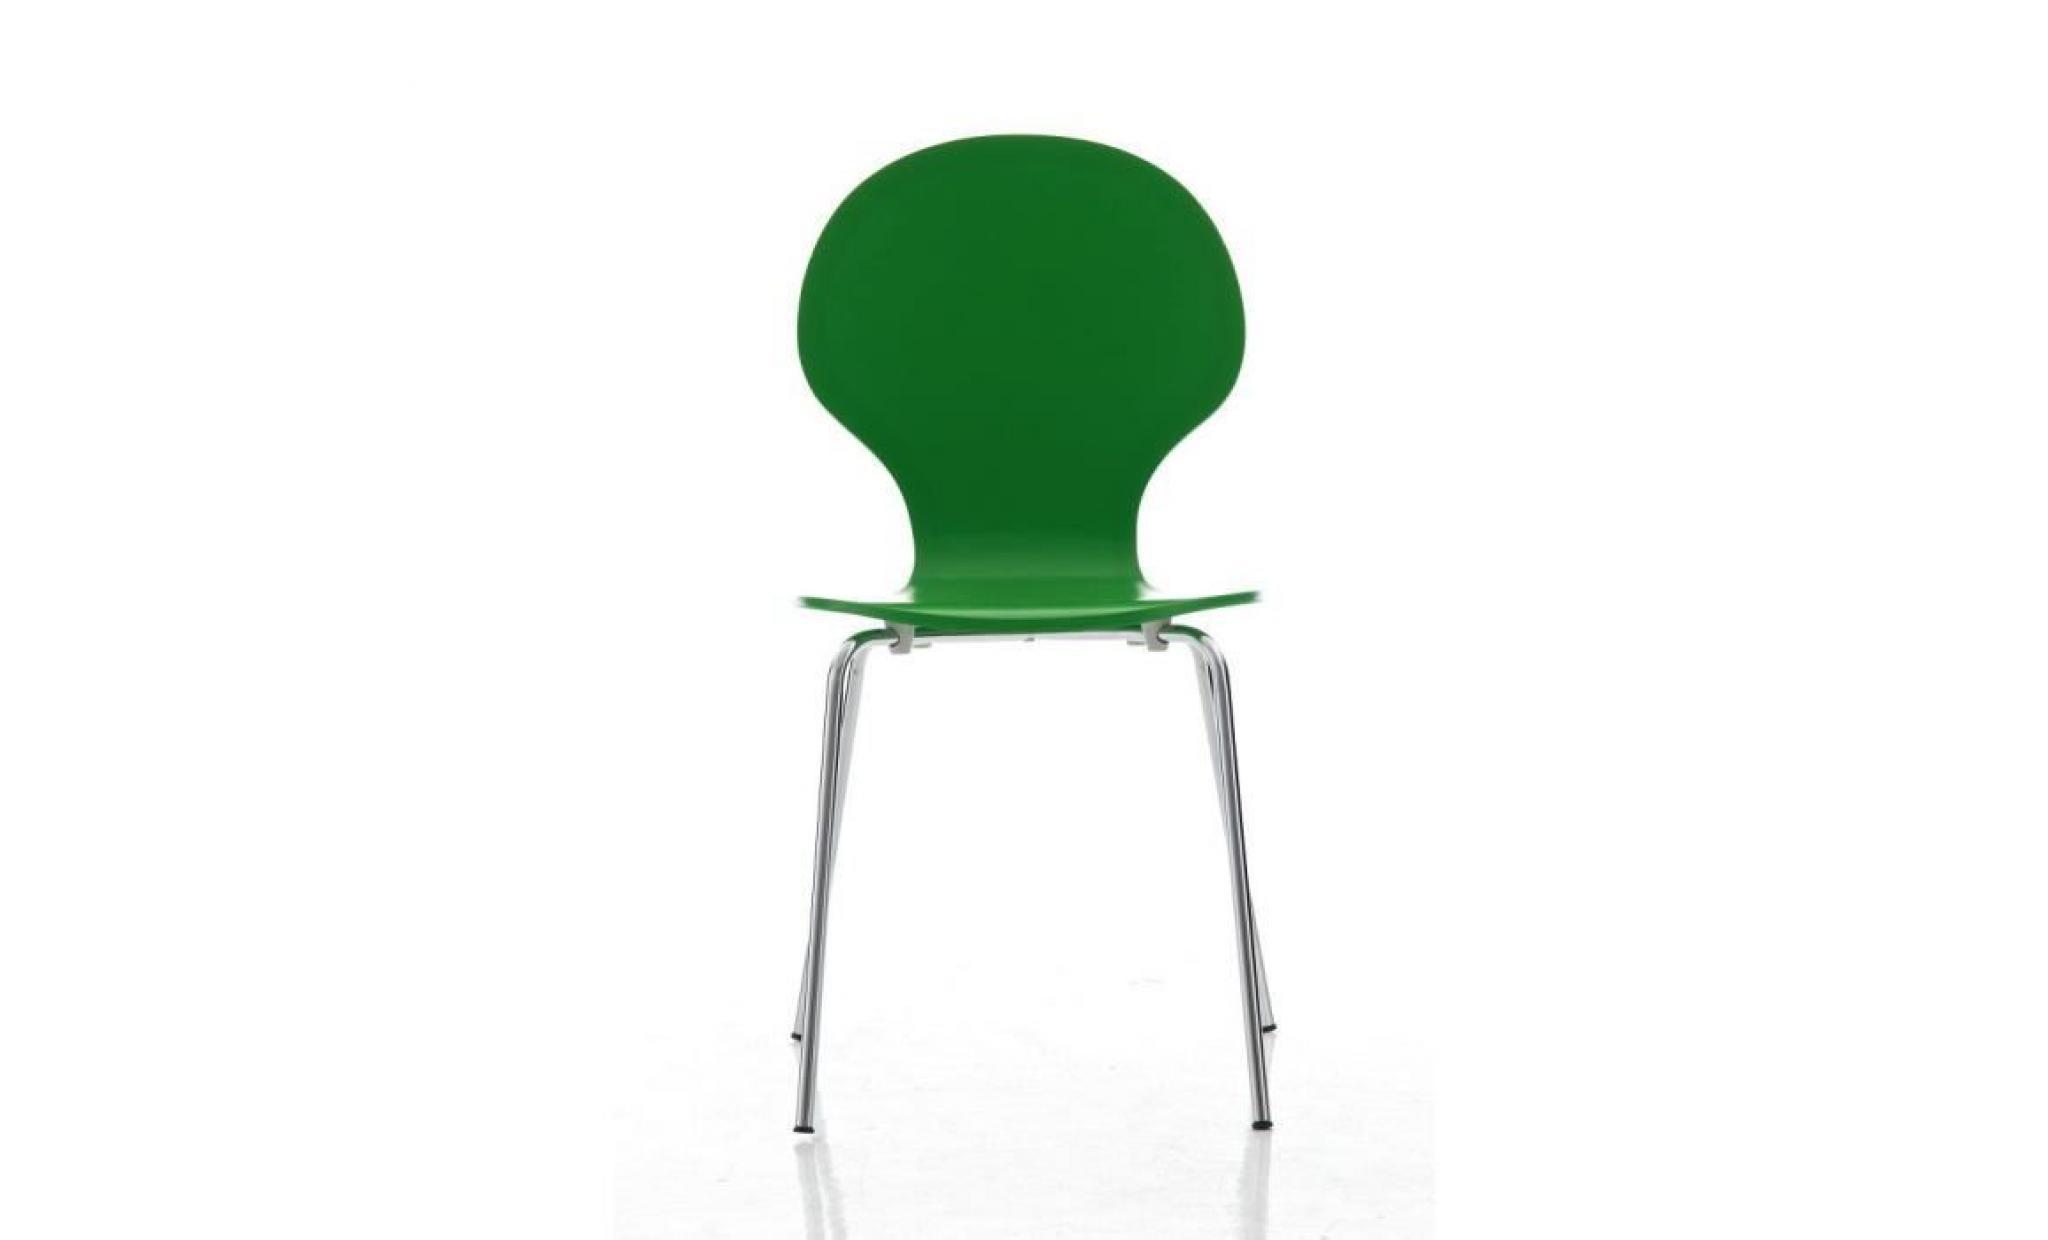 chaise empilable pas cher simple chaises empilables pas. Black Bedroom Furniture Sets. Home Design Ideas